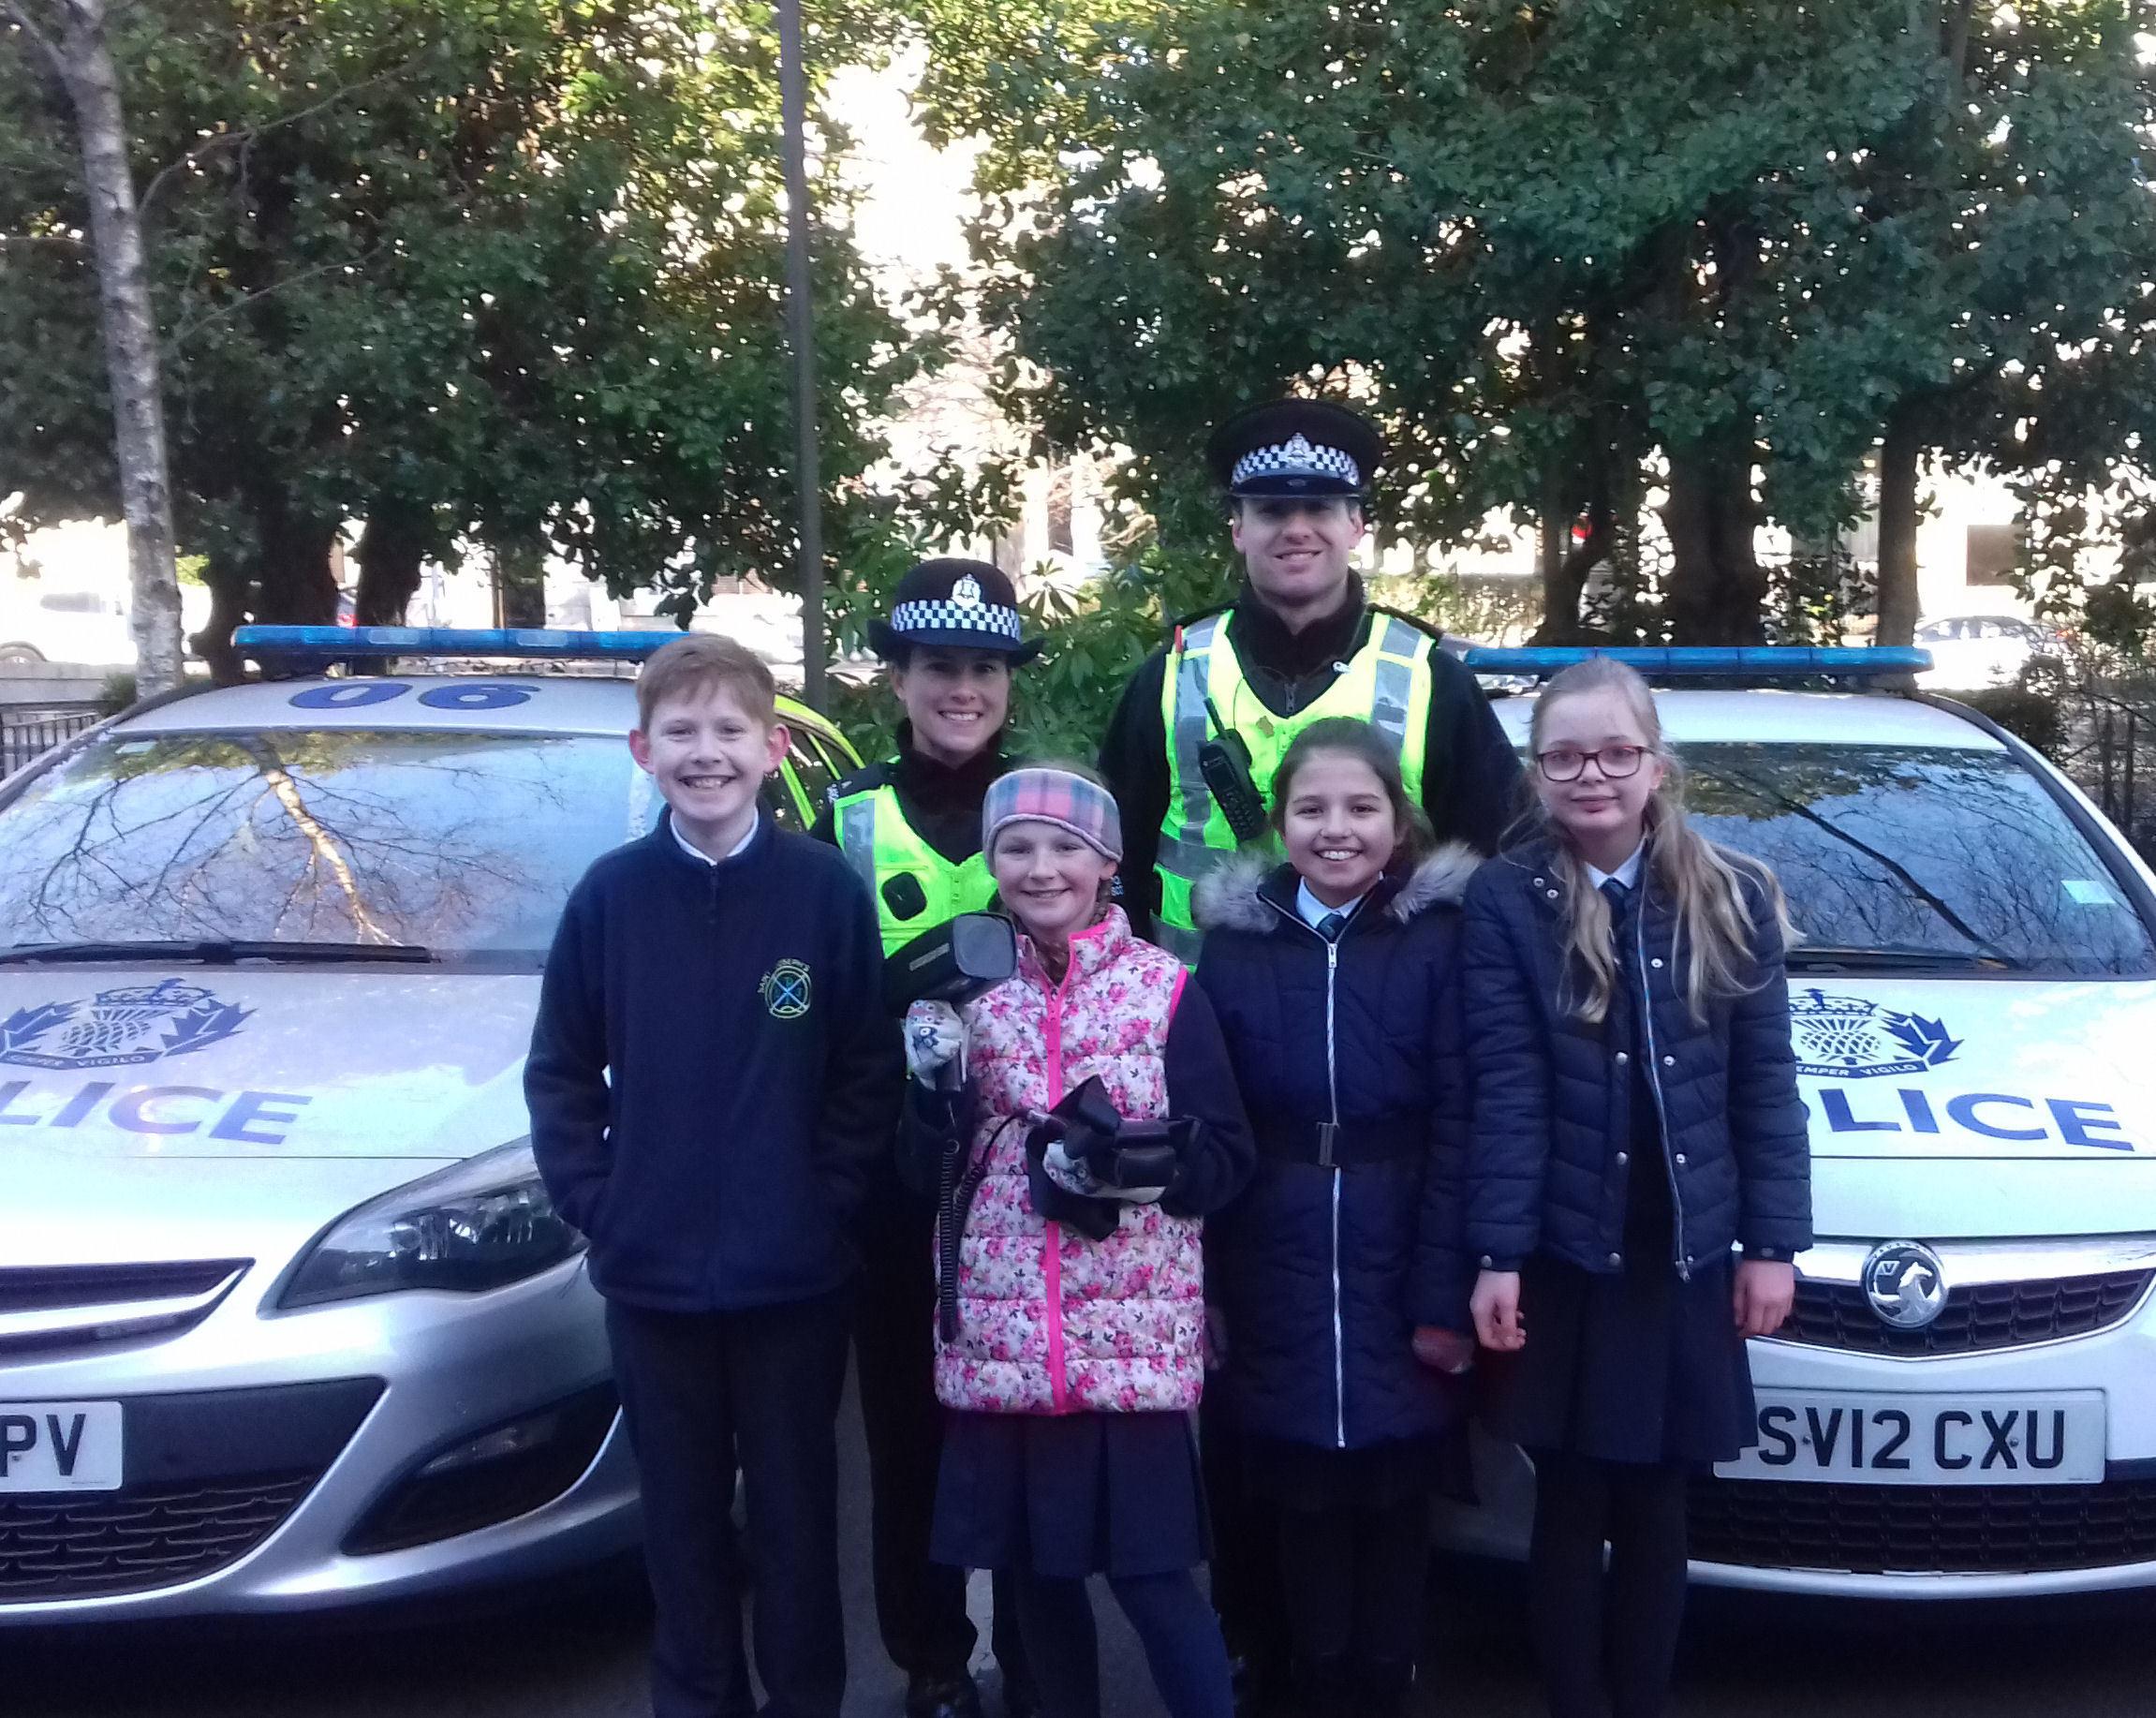 Pupils from St Joseph's School in Aberdeen with PCs Robyn Watt and PC Jake Balderson.